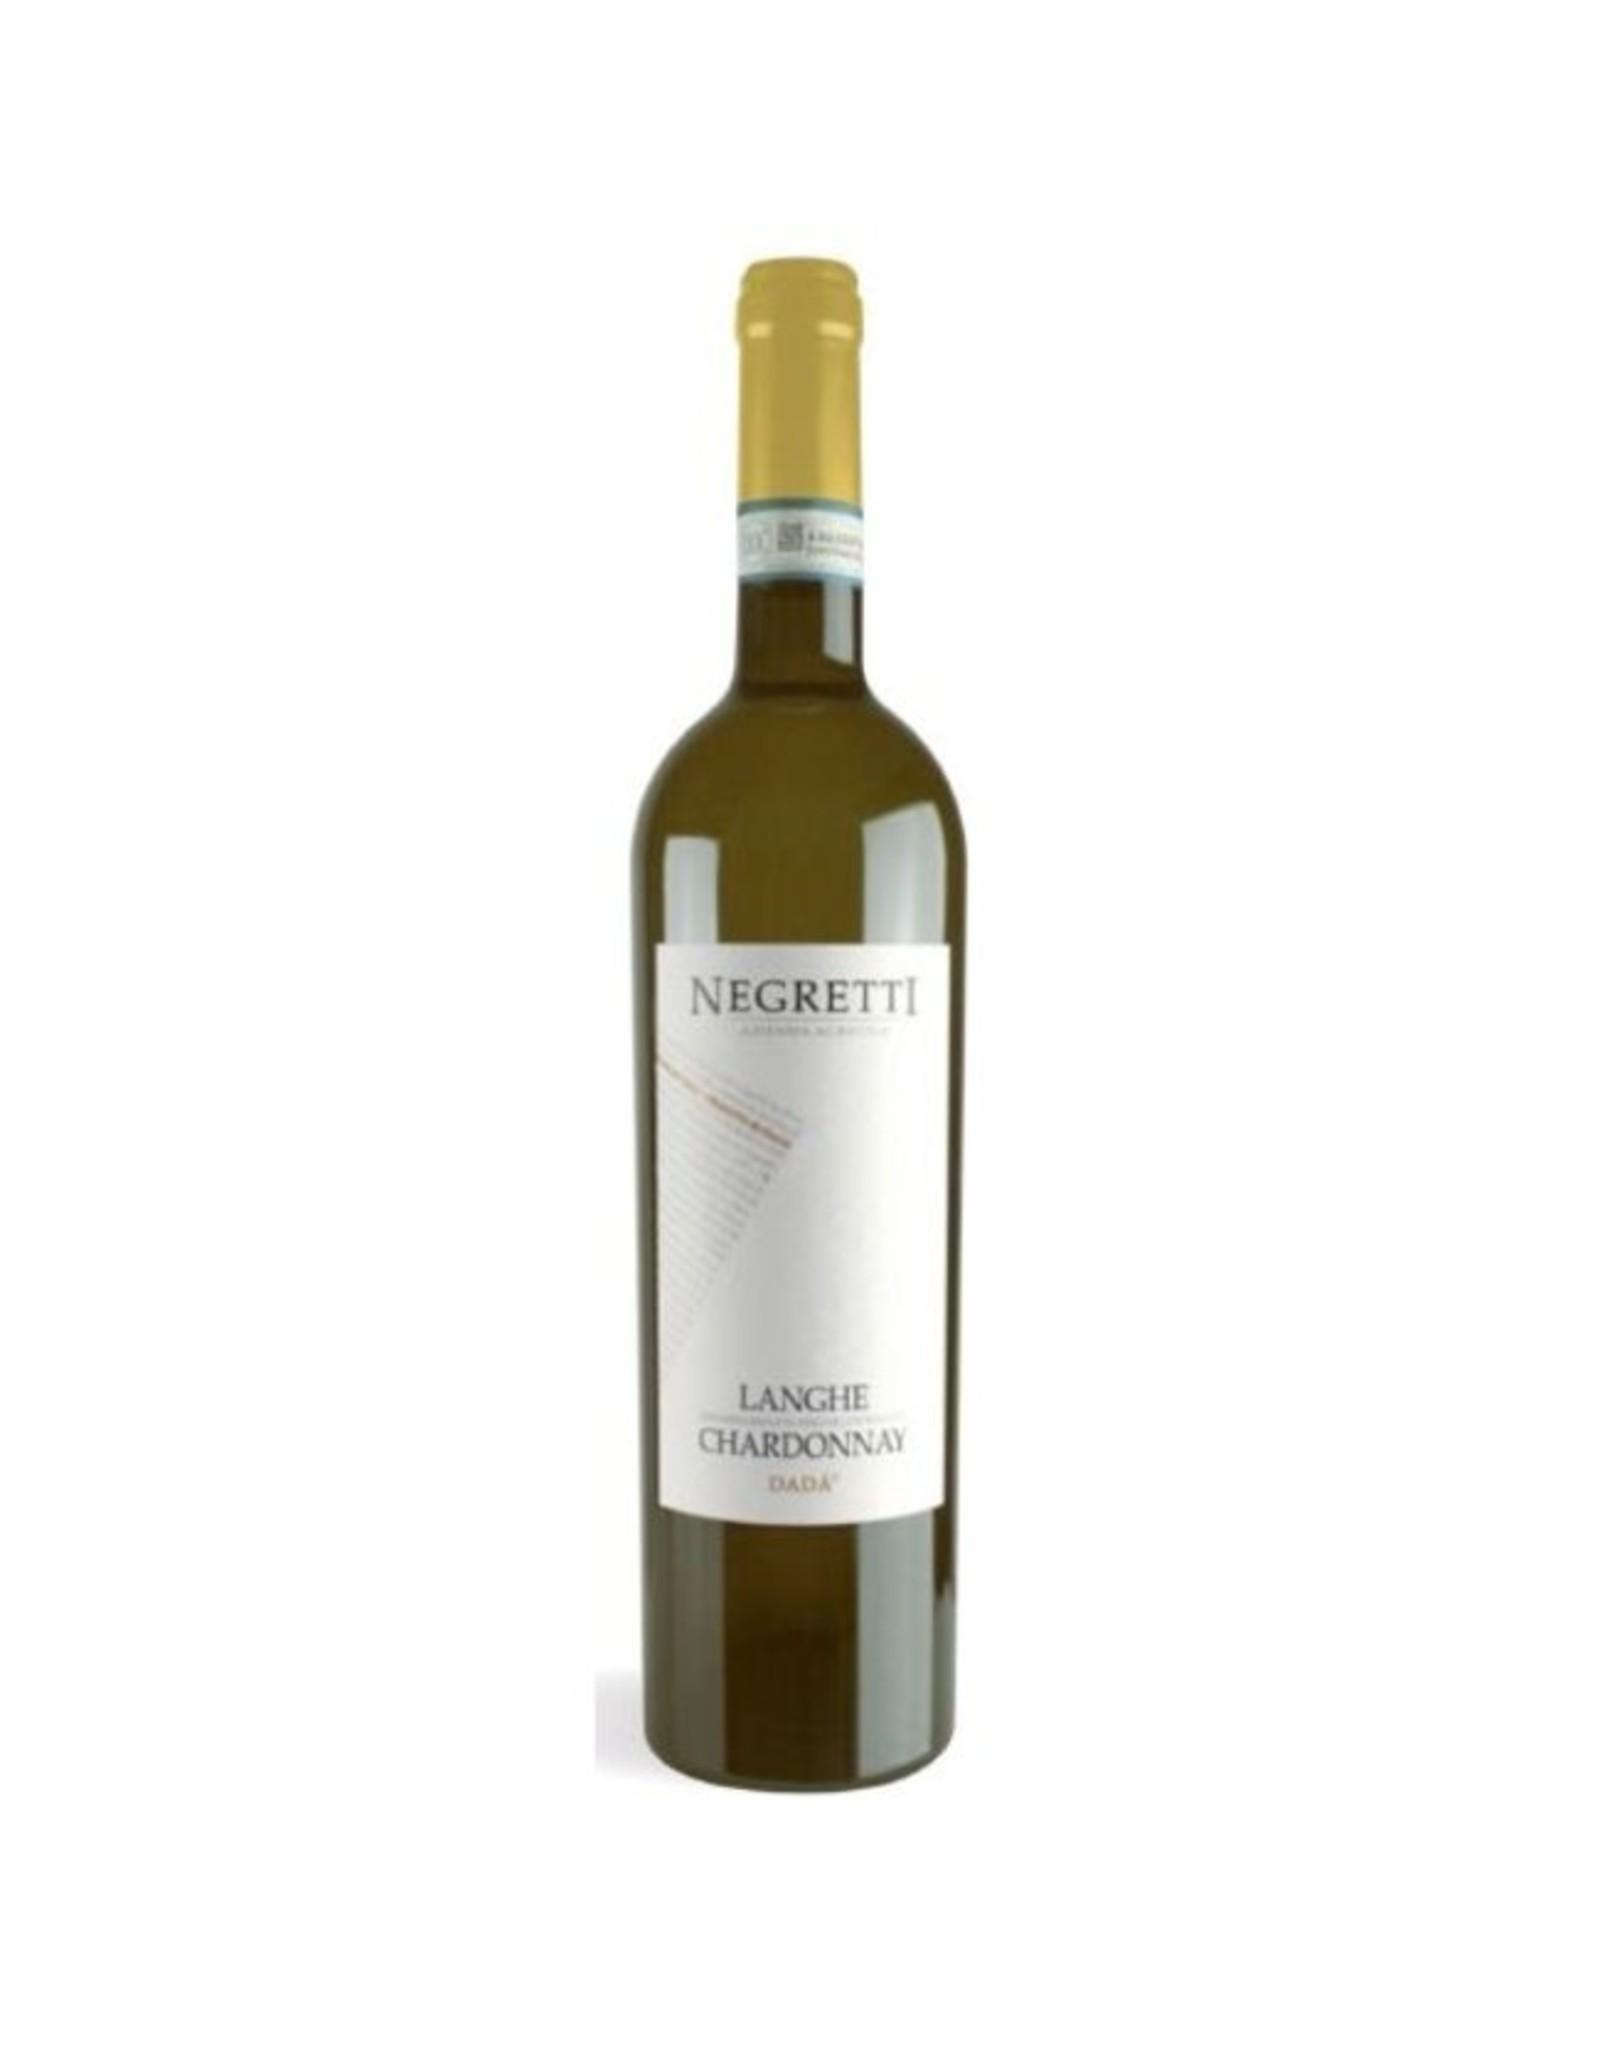 Negretti Negretti Langhe Chardonnay